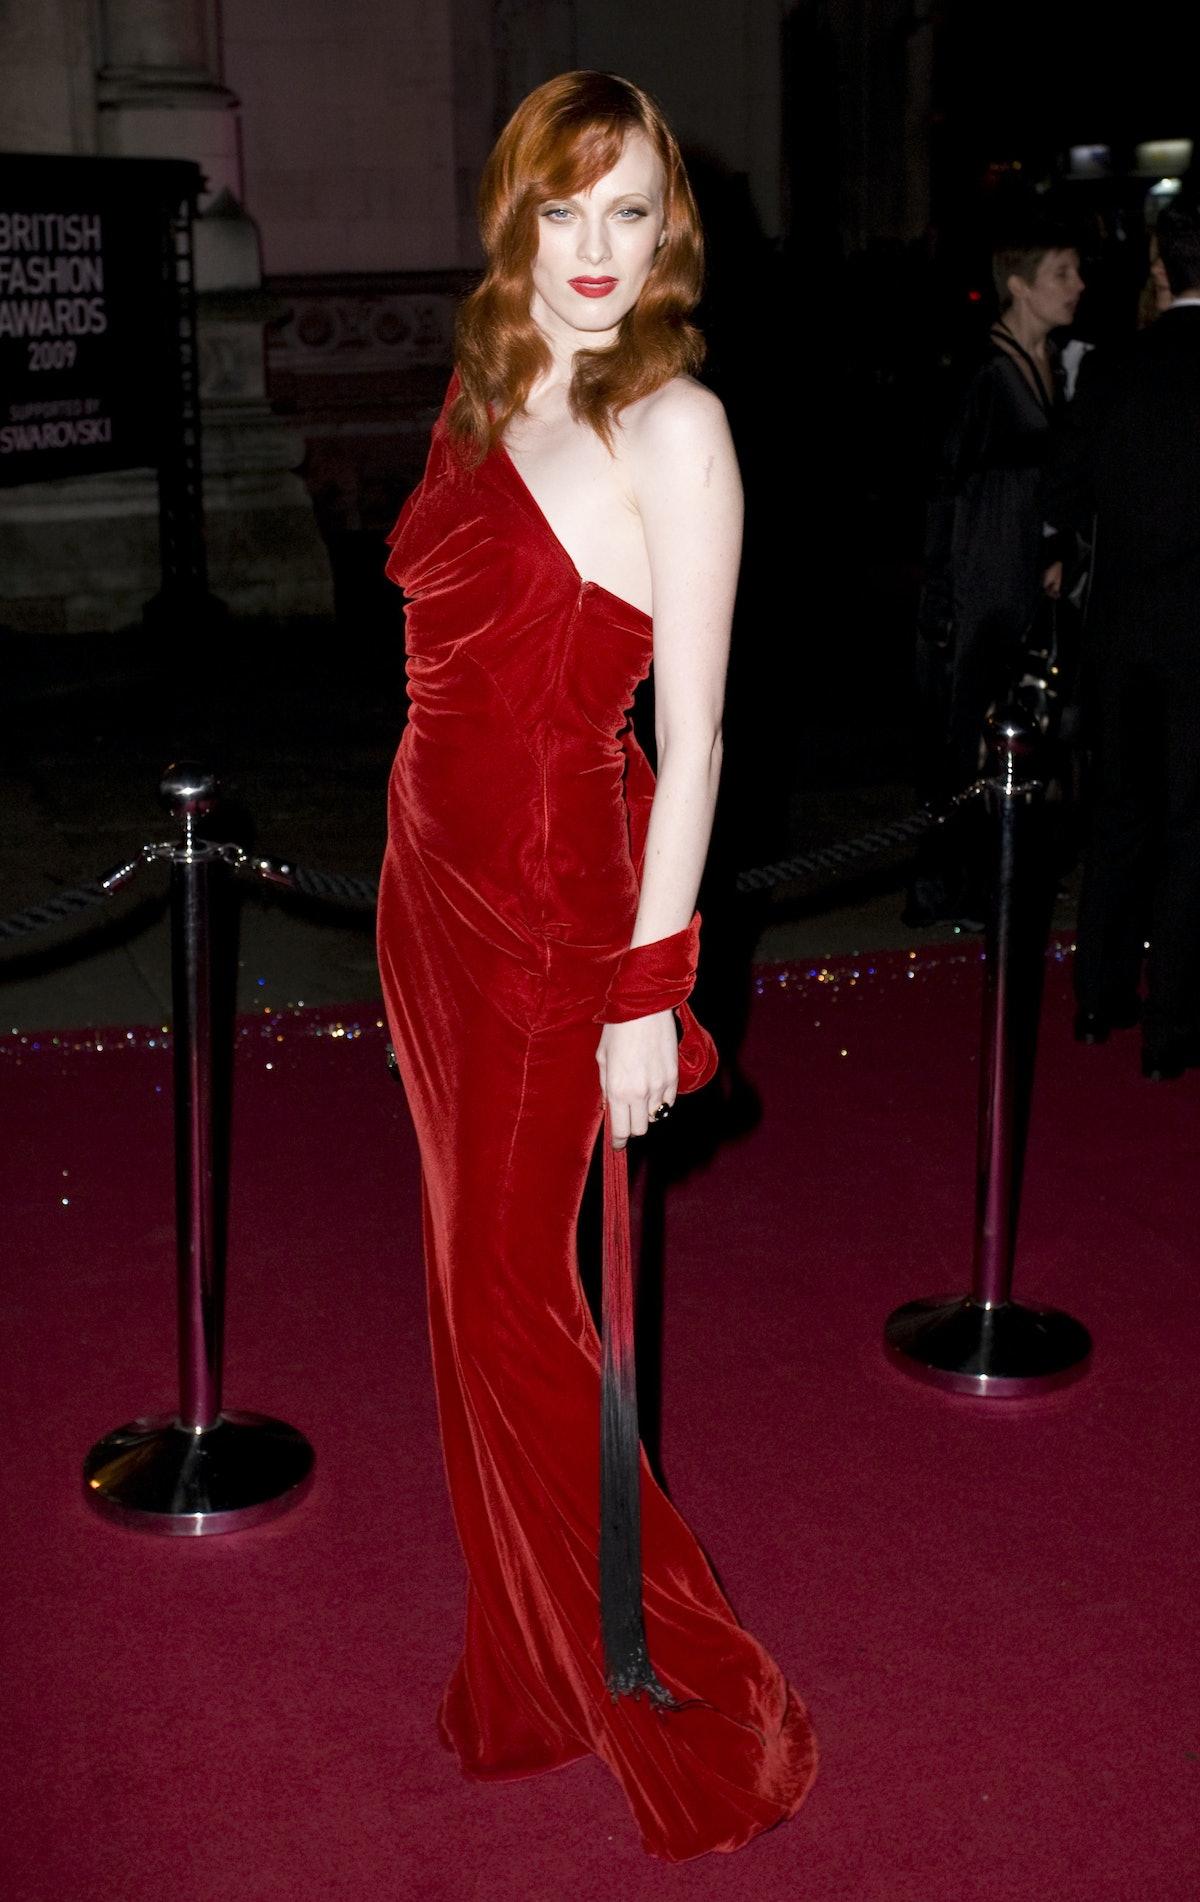 British Fashion Awards - London